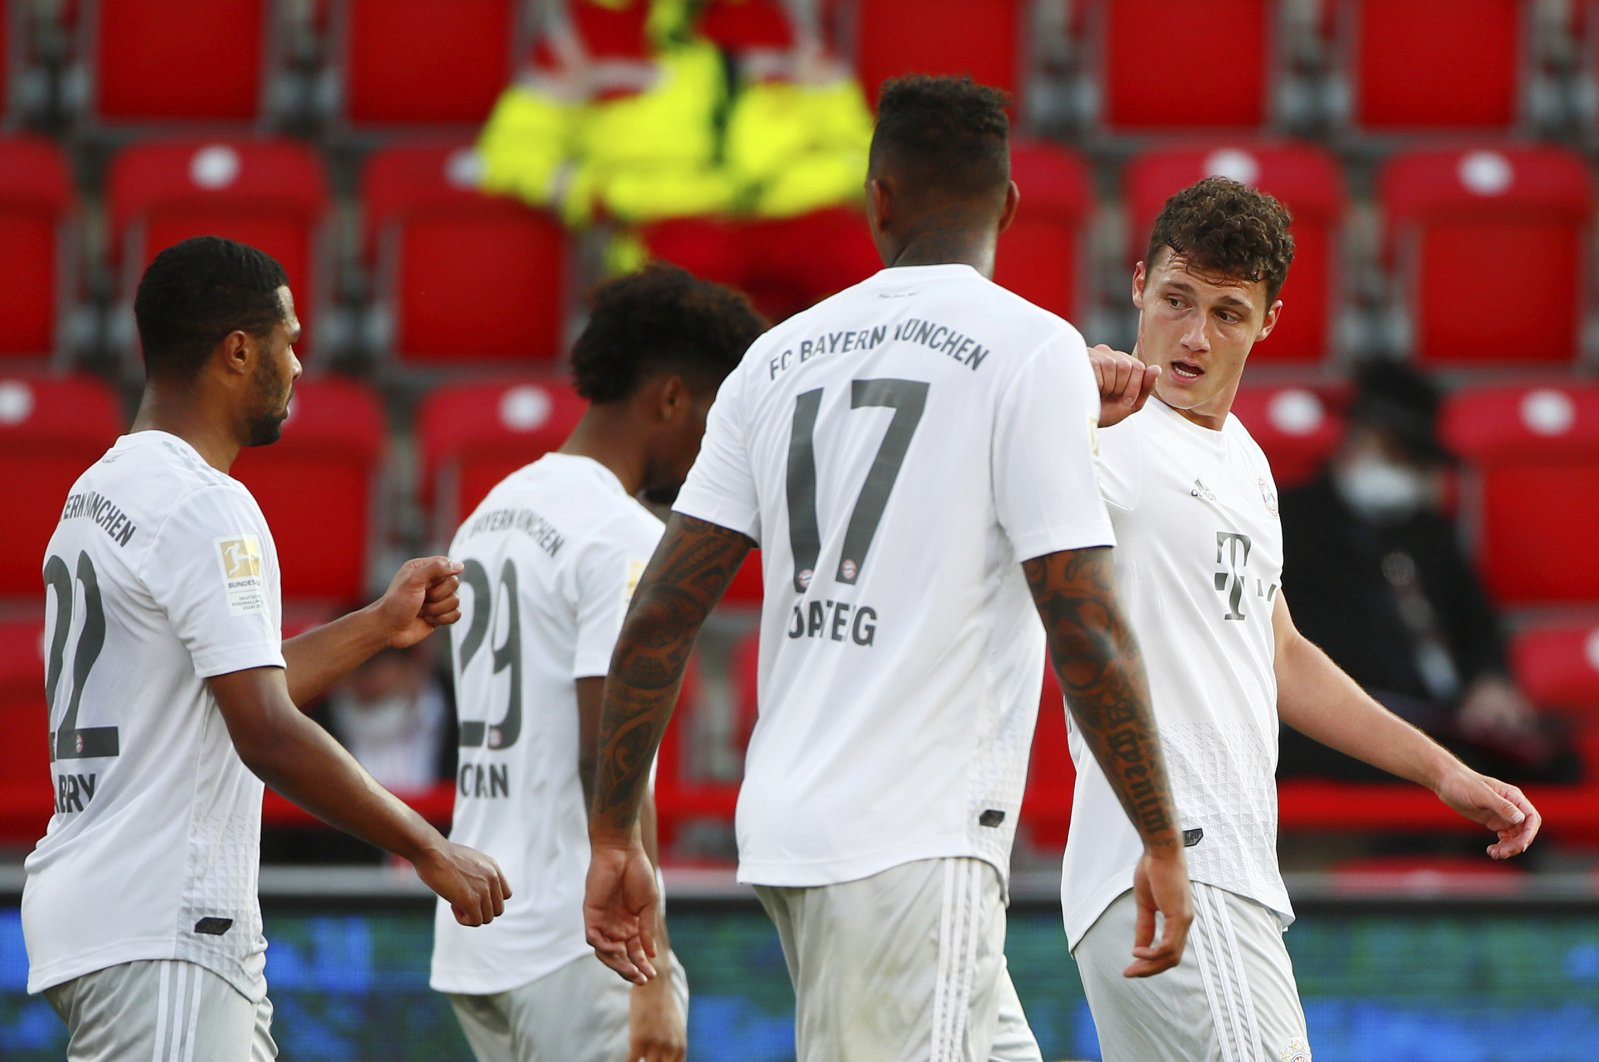 Bayern Munich's Benjamin Pavard (R) celebrates his side's second goal during the German Bundesliga against Union Berlin, Berlin, Germany, Sunday, May 17, 2020. (AP Photo)